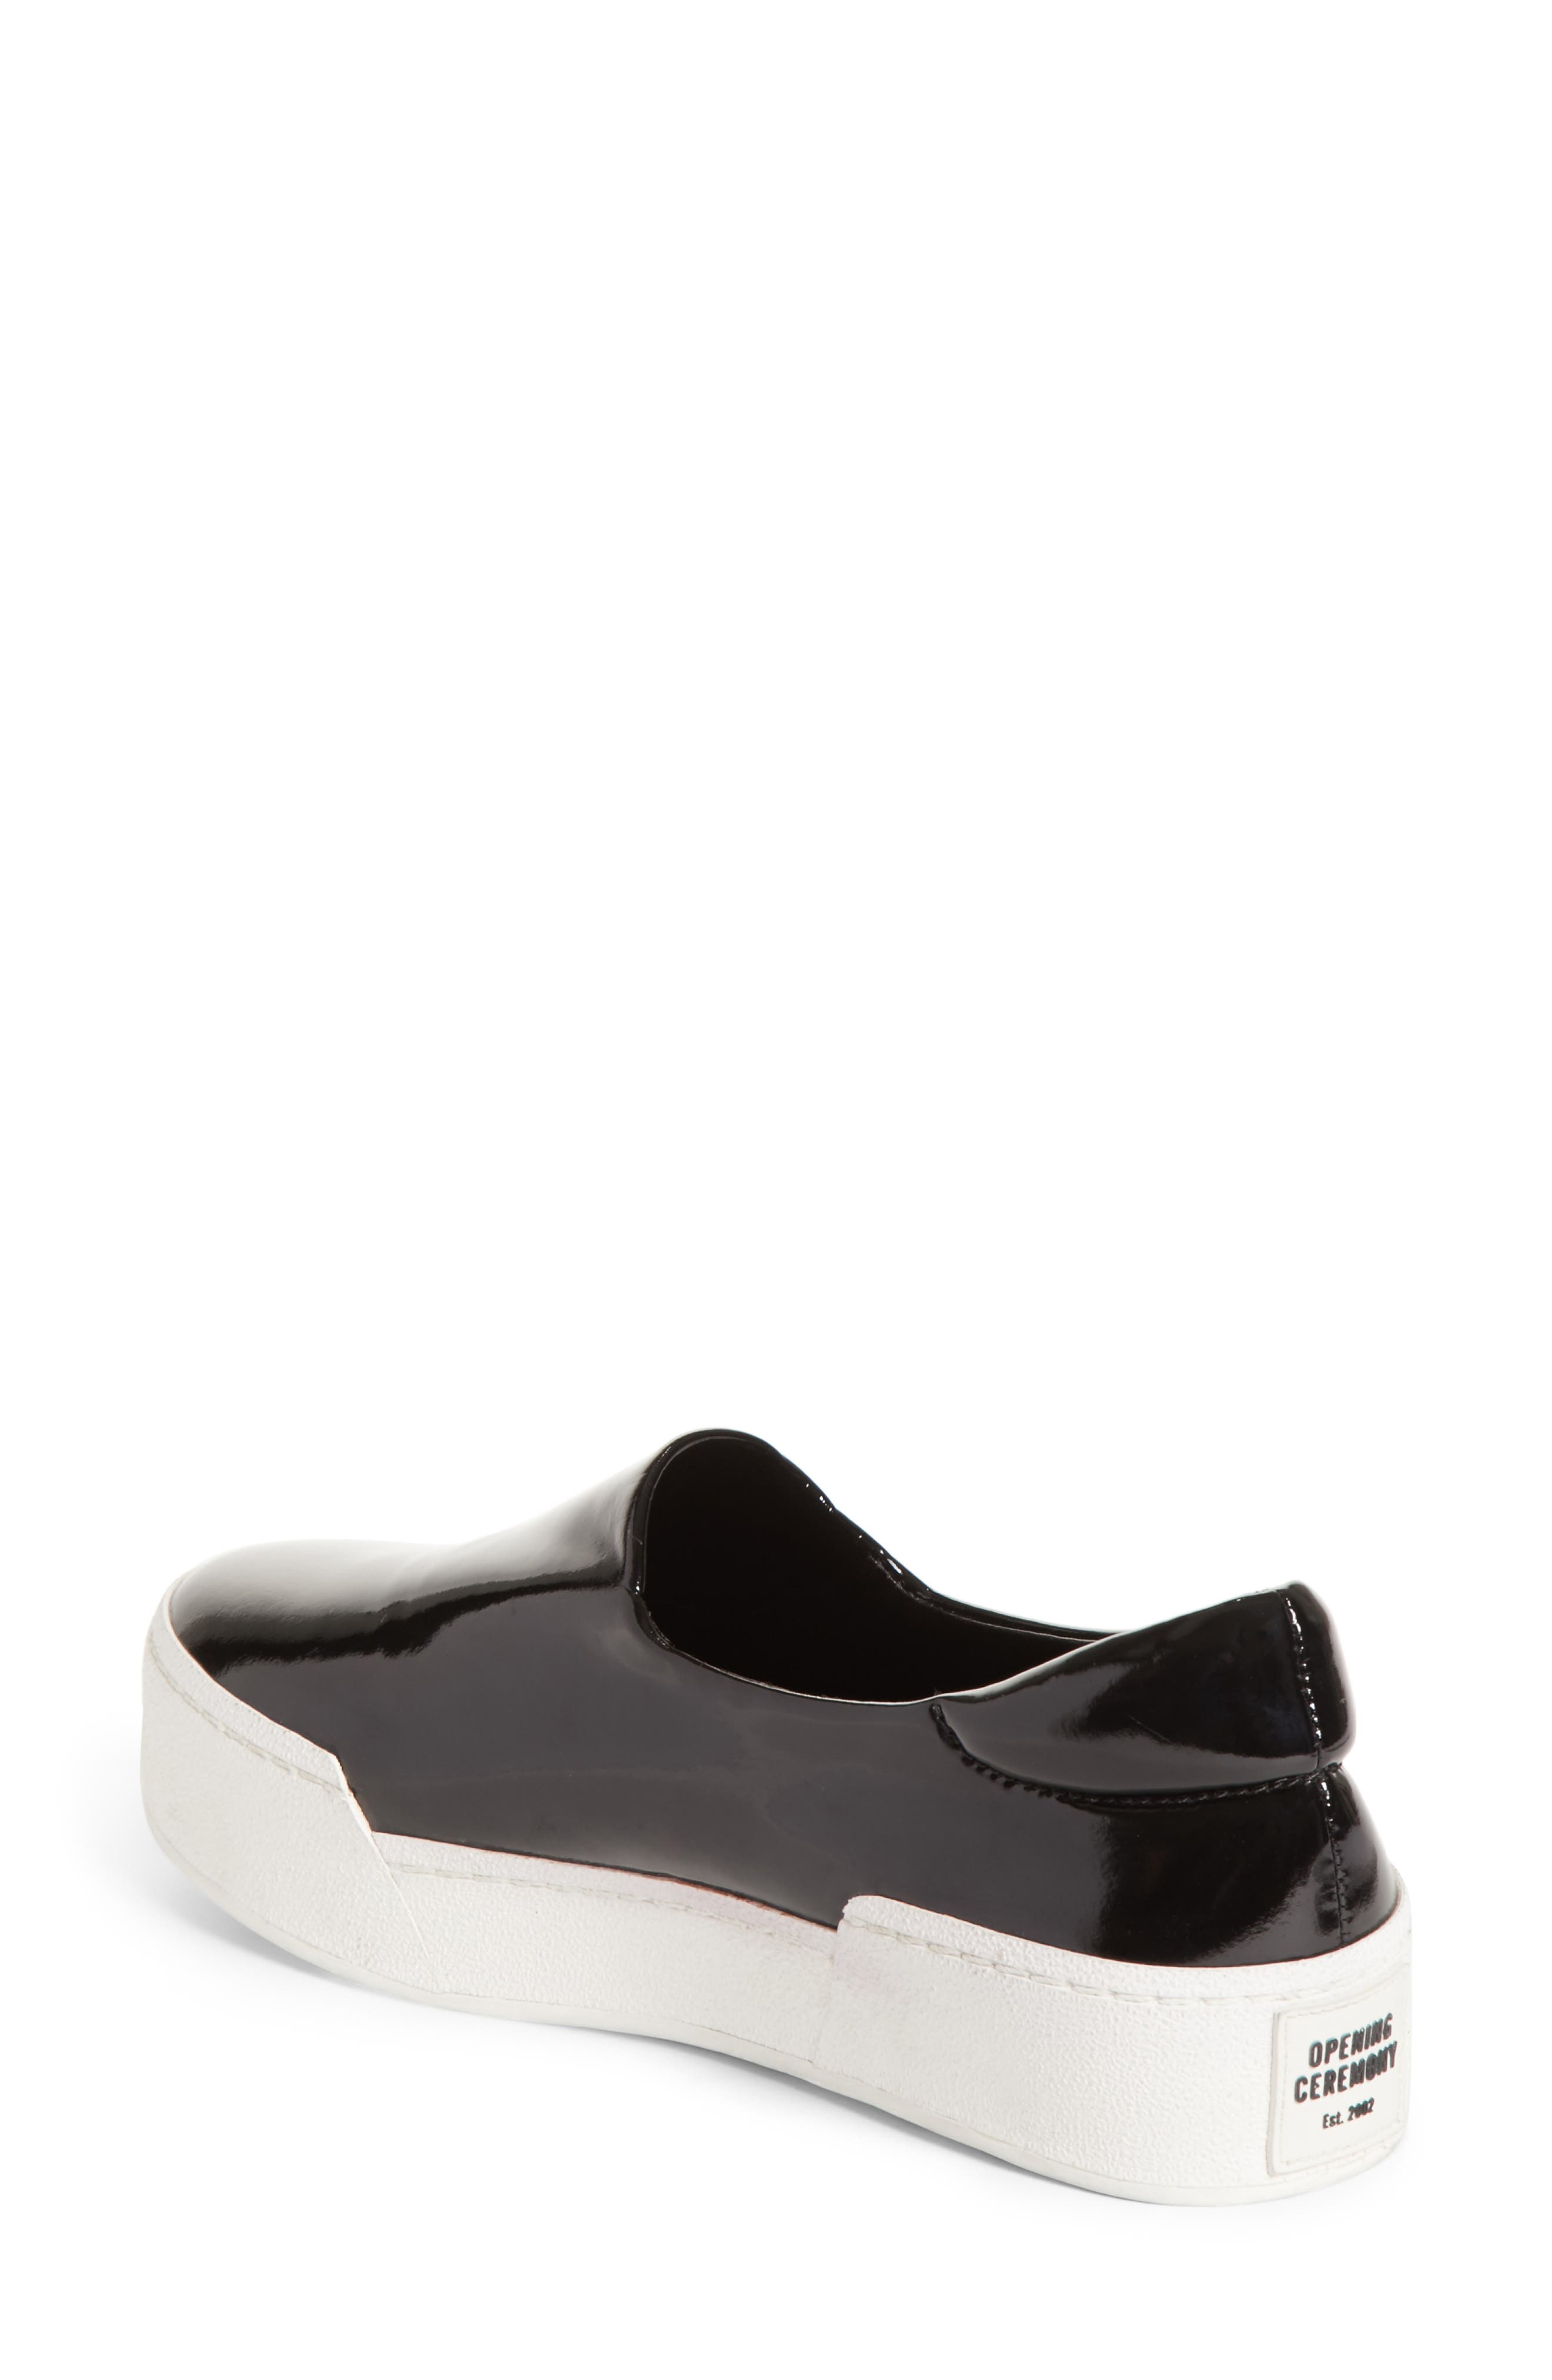 Didi Slip-On Sneaker,                             Alternate thumbnail 2, color,                             001